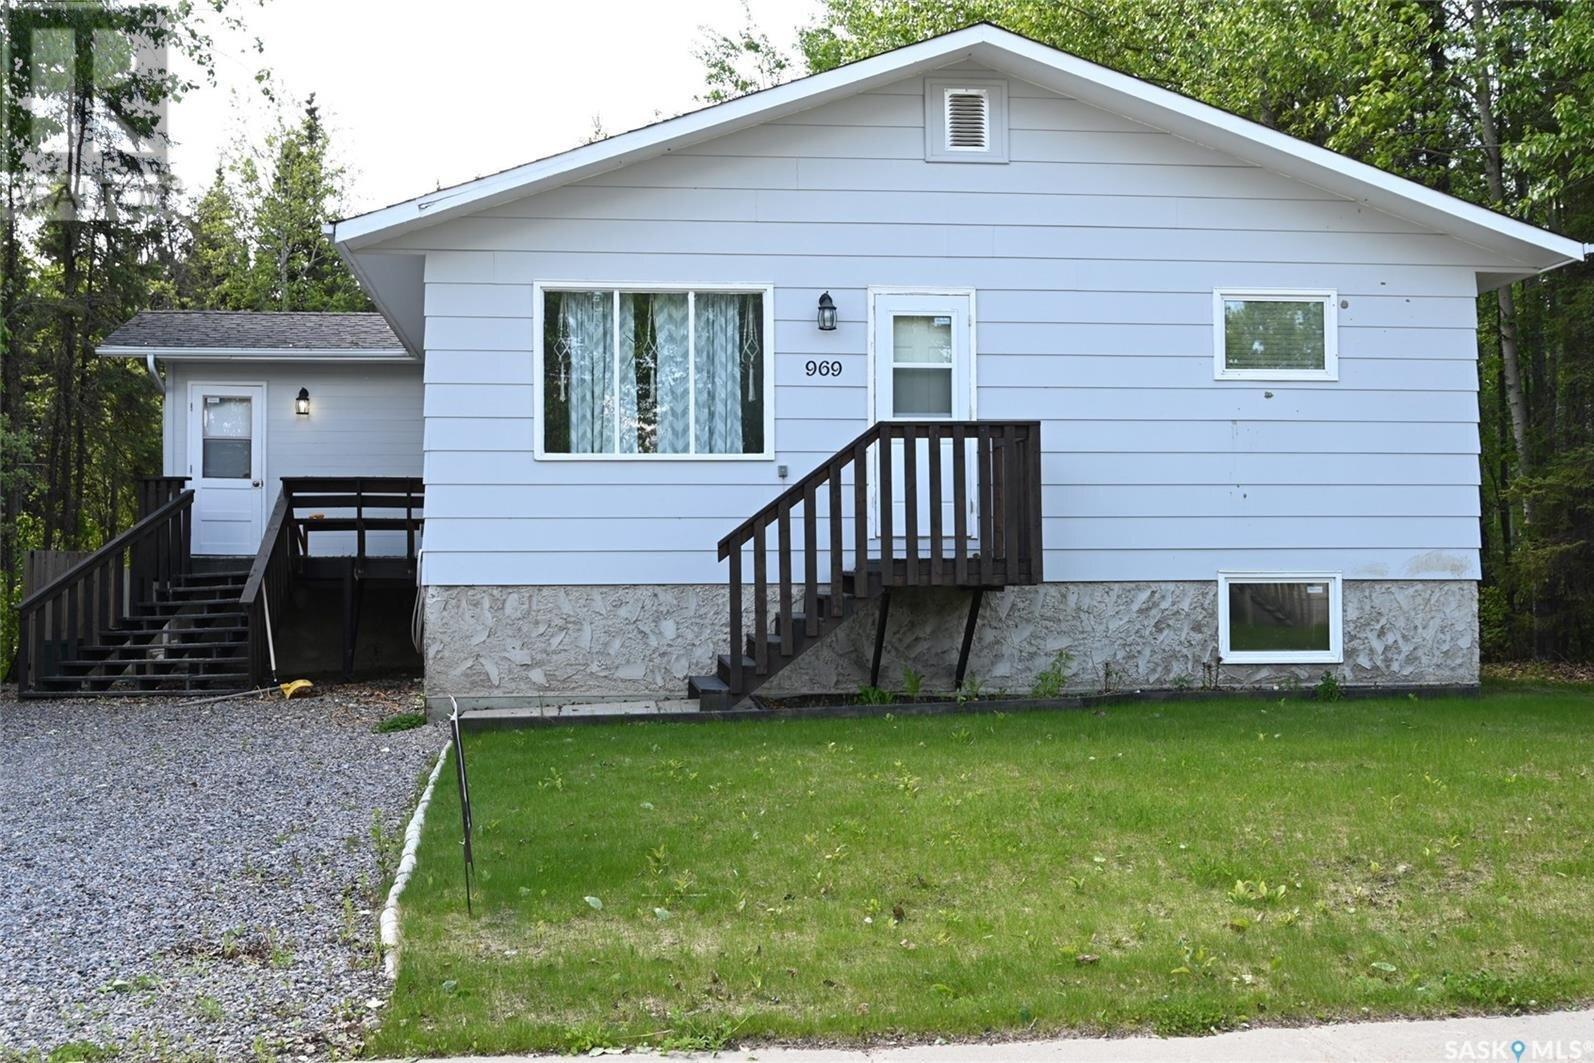 House for sale at 969 Sinotte Cres La Ronge Saskatchewan - MLS: SK839236